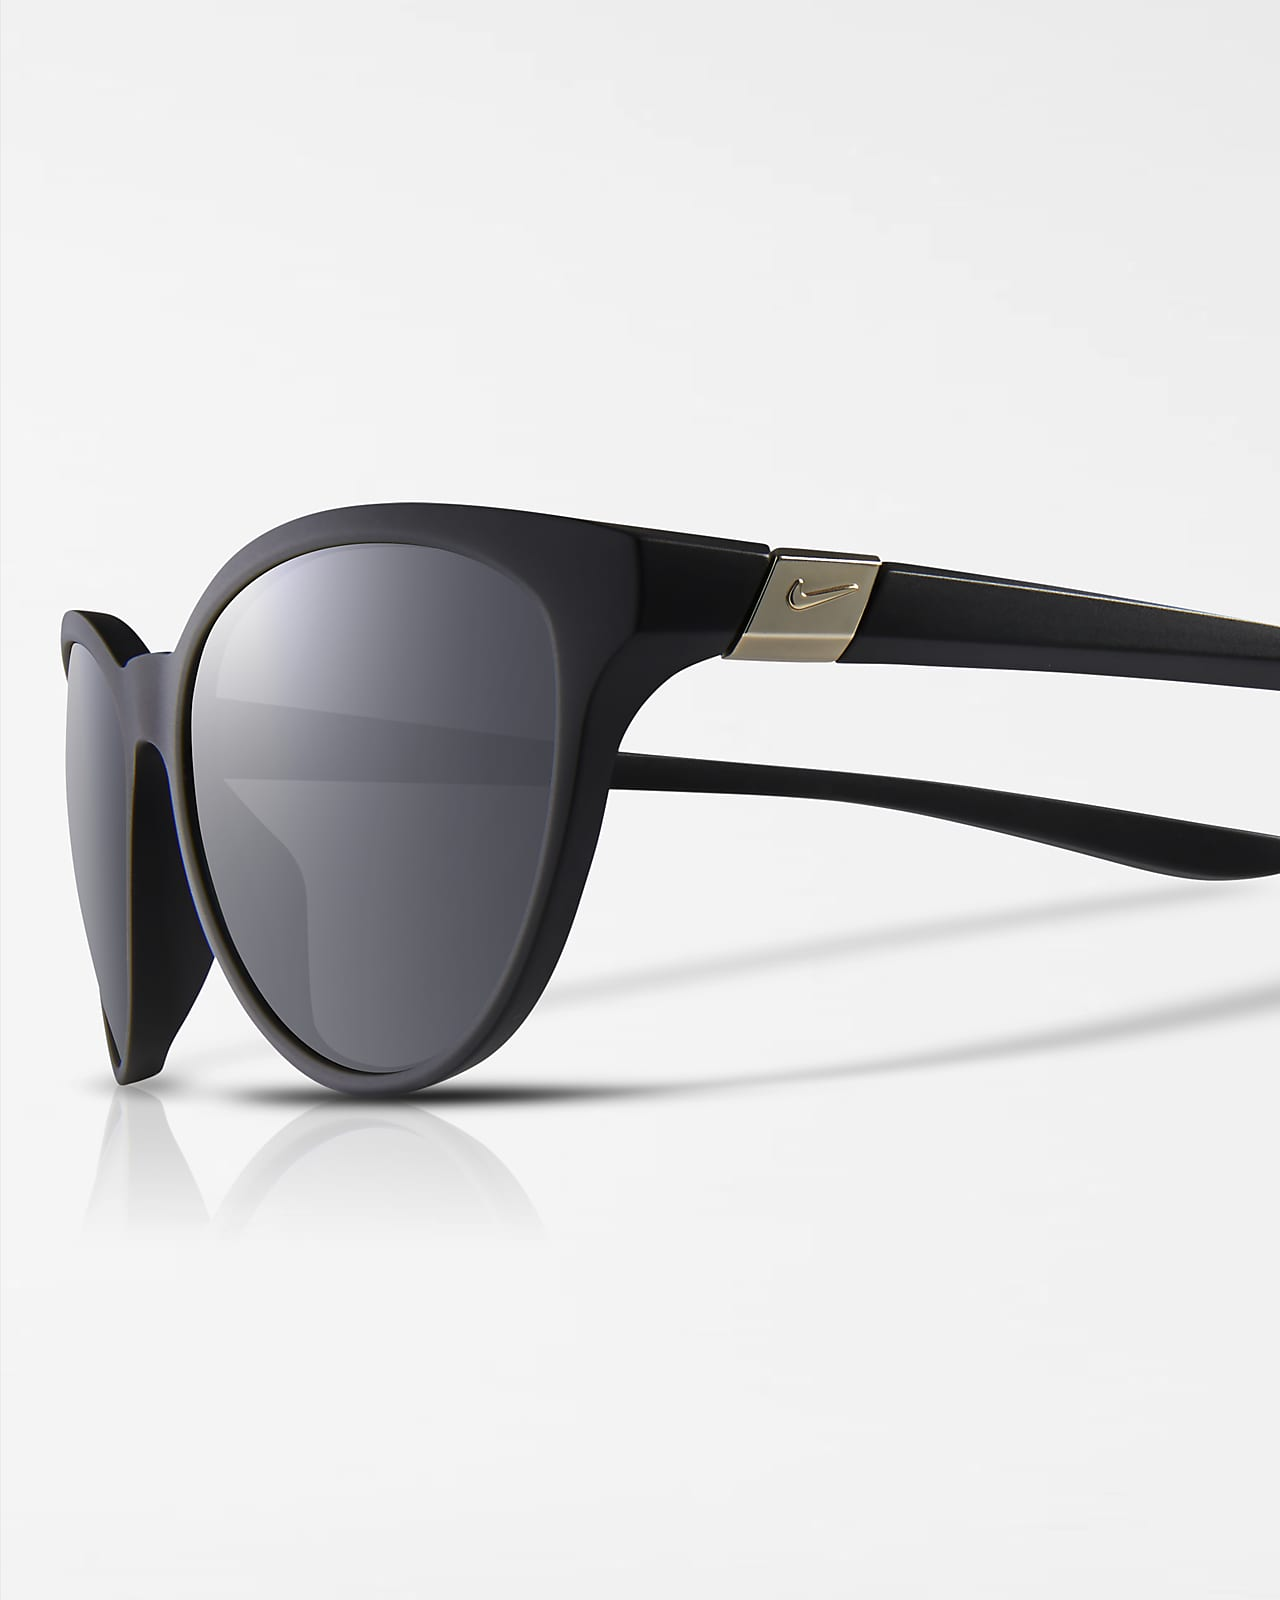 Nike City Persona Sunglasses